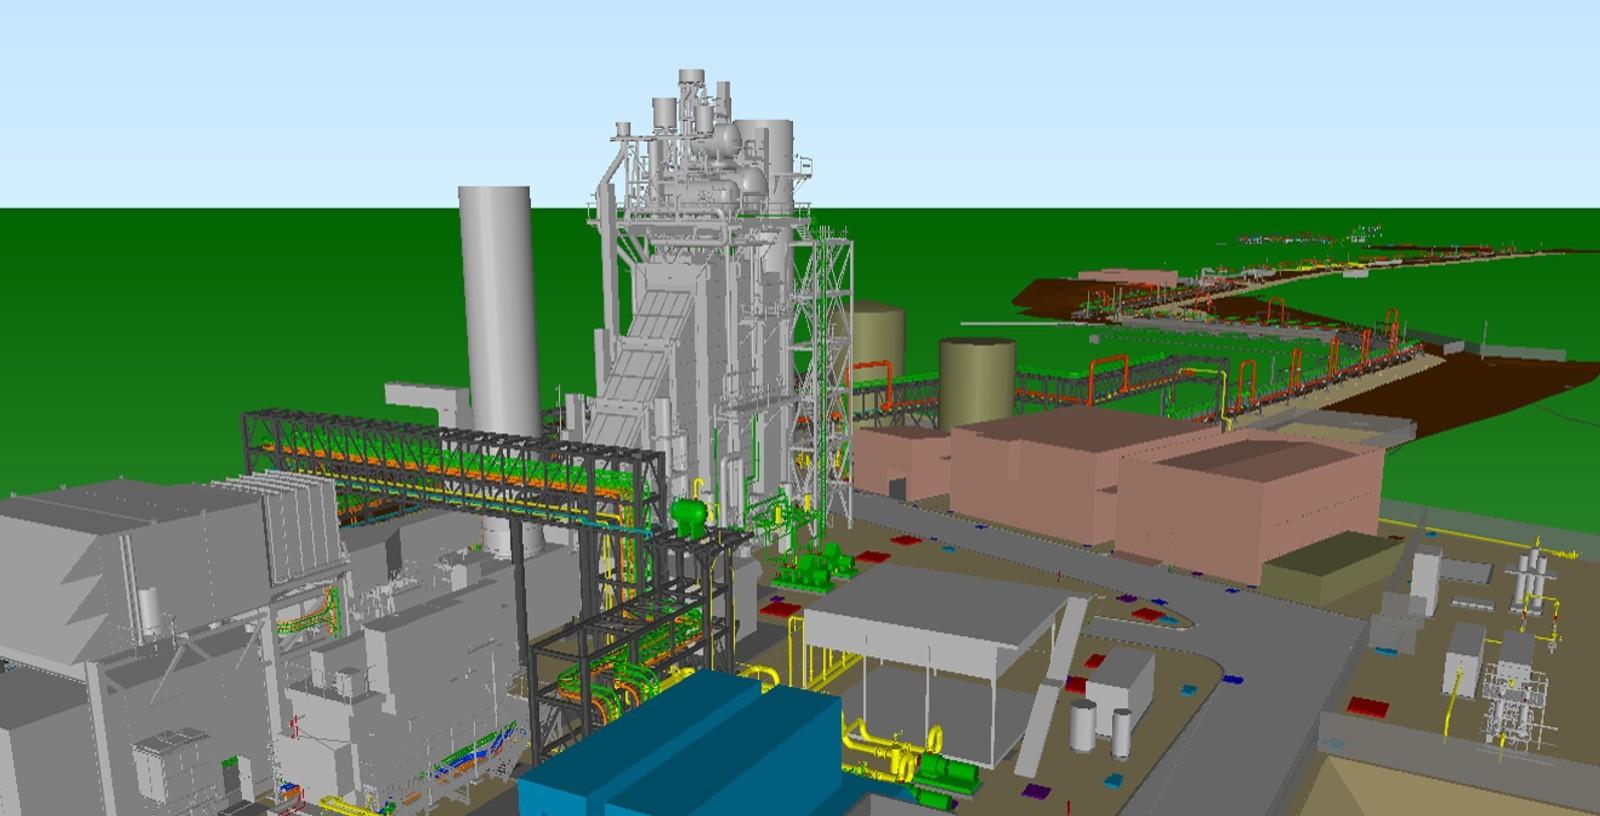 Aconcagua_Cogeneration_CCGT_Concon-Refinery_Duro-Felguera_IDOM_4